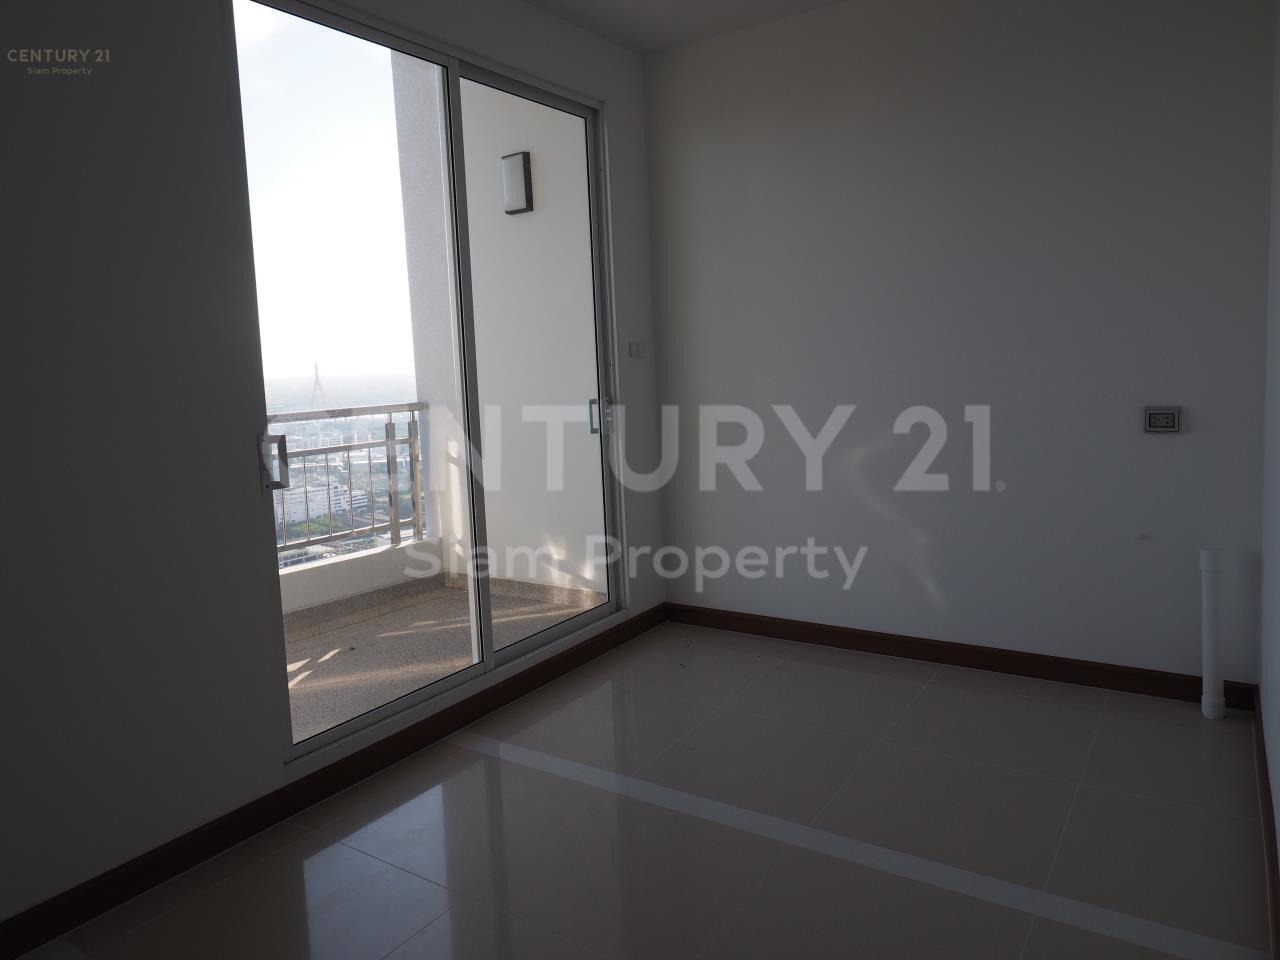 Century21 Siam Property Agency's Supalai Prima Riva 31